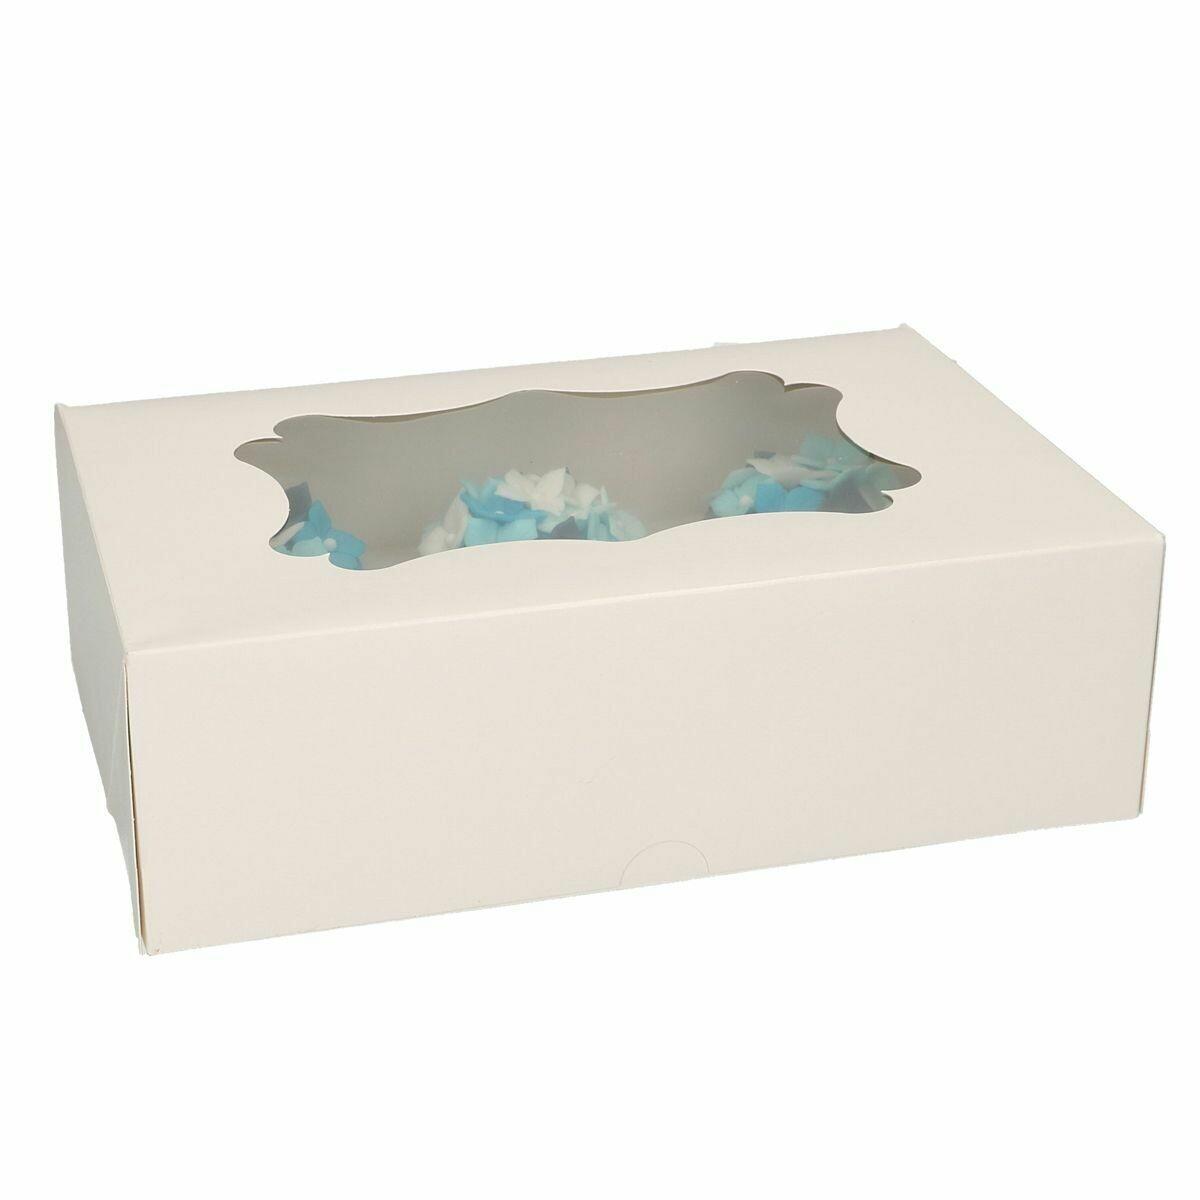 Box for 6 Cupcakes -Κουτί για 6 Καπκέϊκς